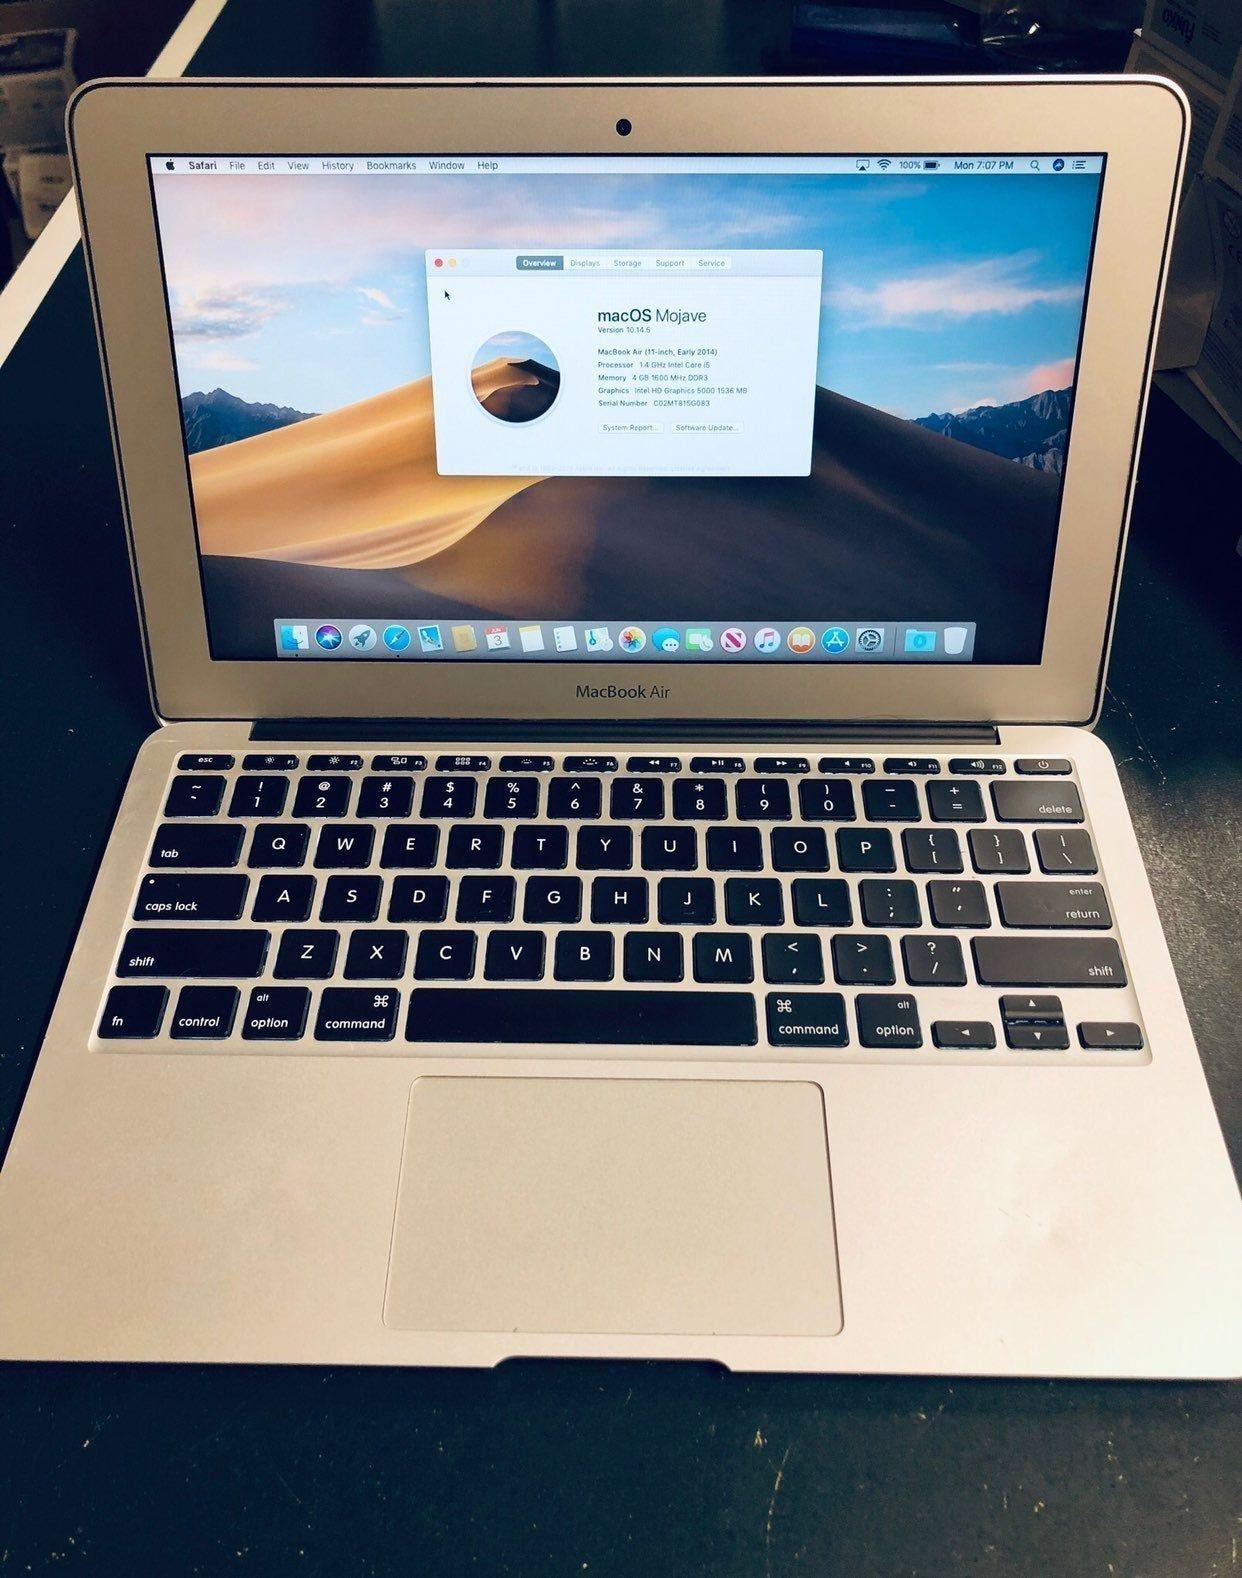 * Apple MacBook Air 11 inch Early 2014 * Intel Core i5 1.4